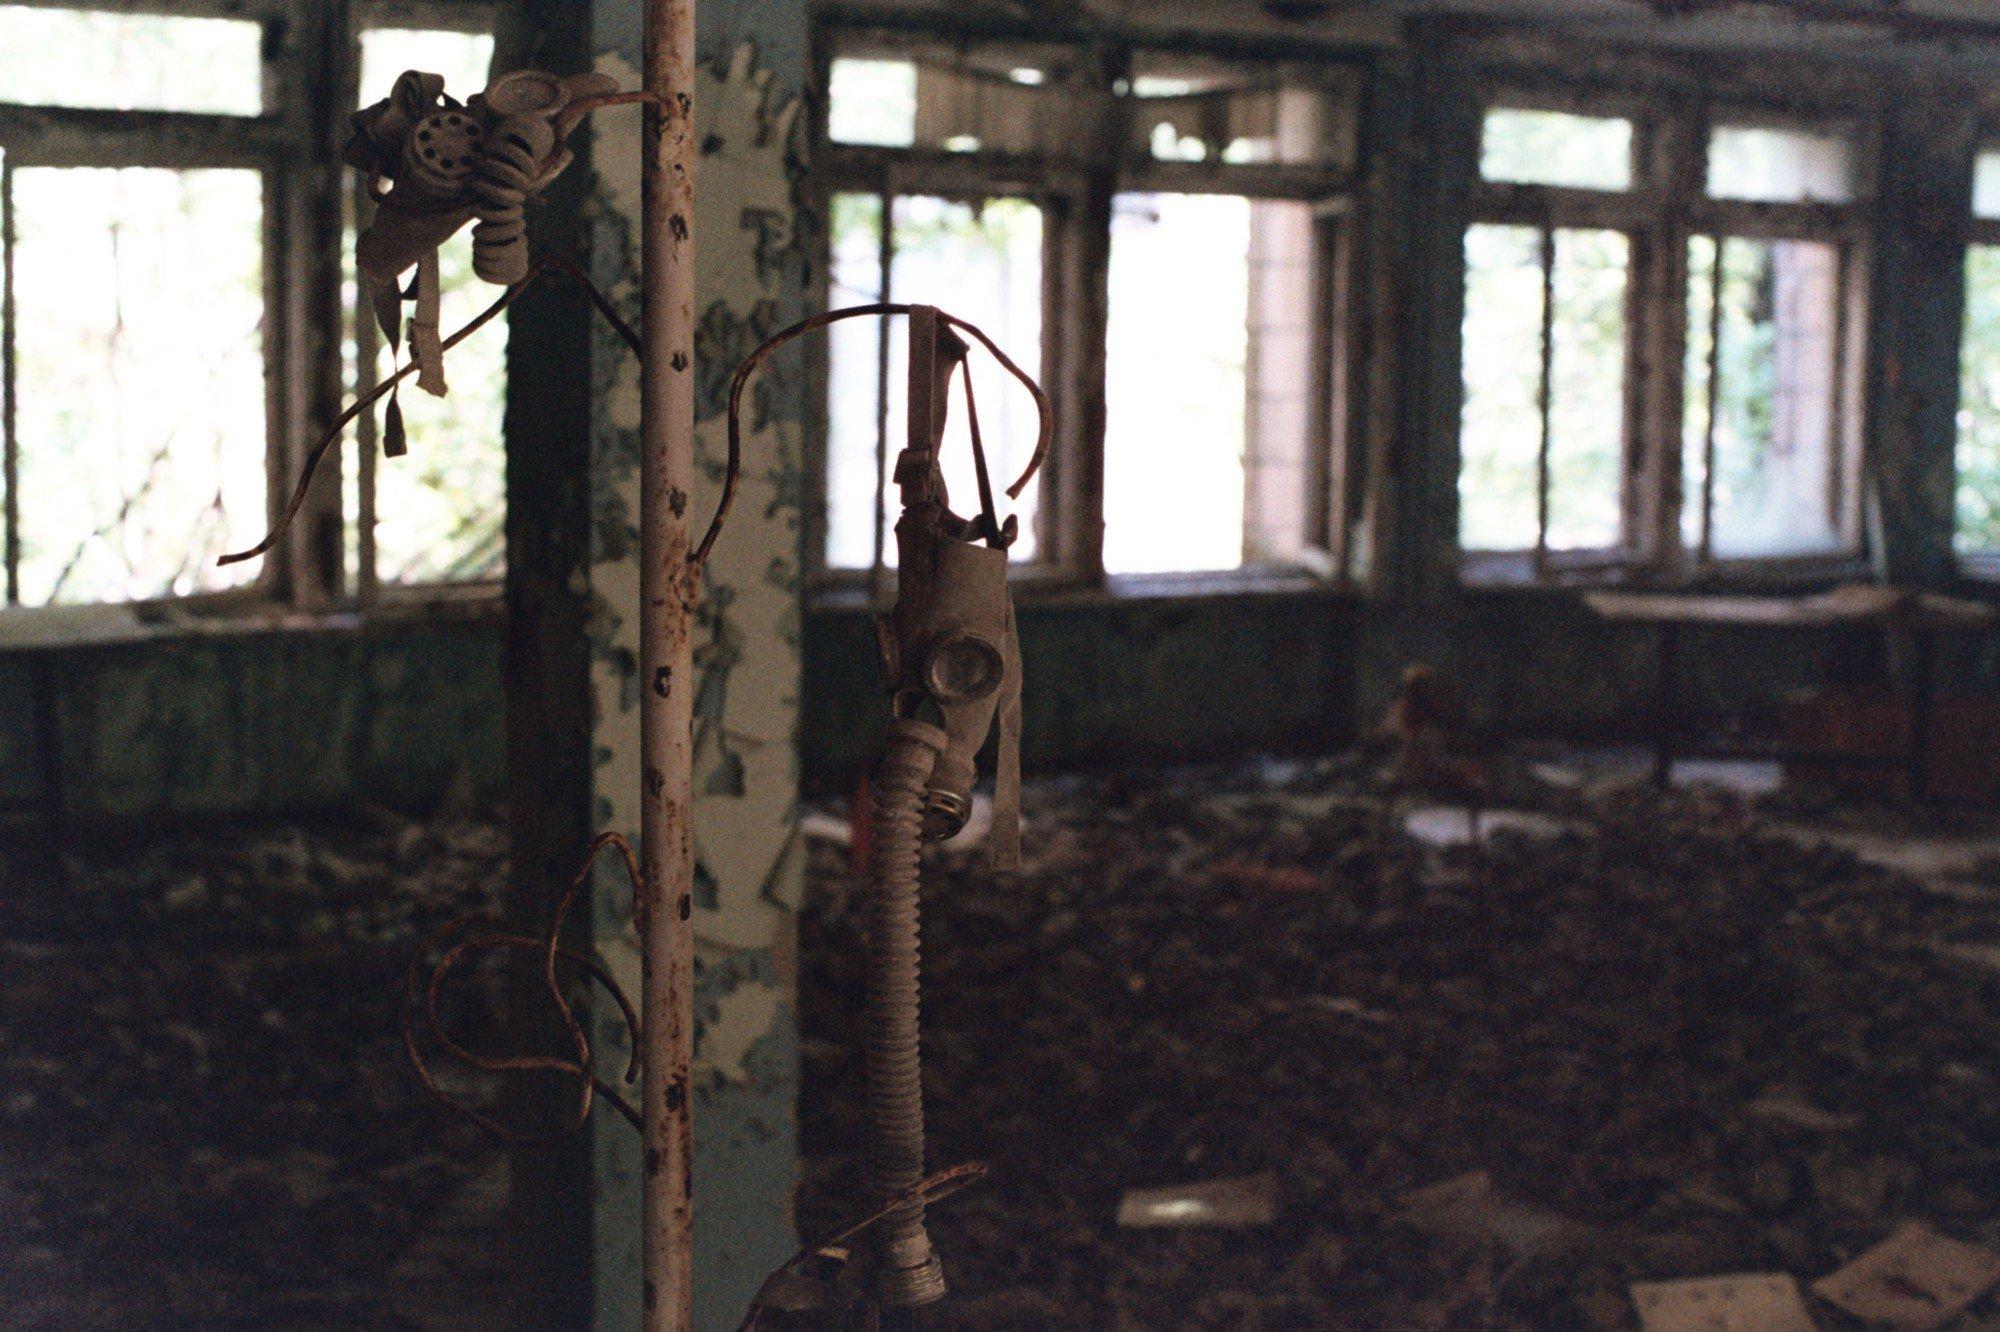 snaeking-into-chernobyl18 SNEAKING INTO CHERNOBYL